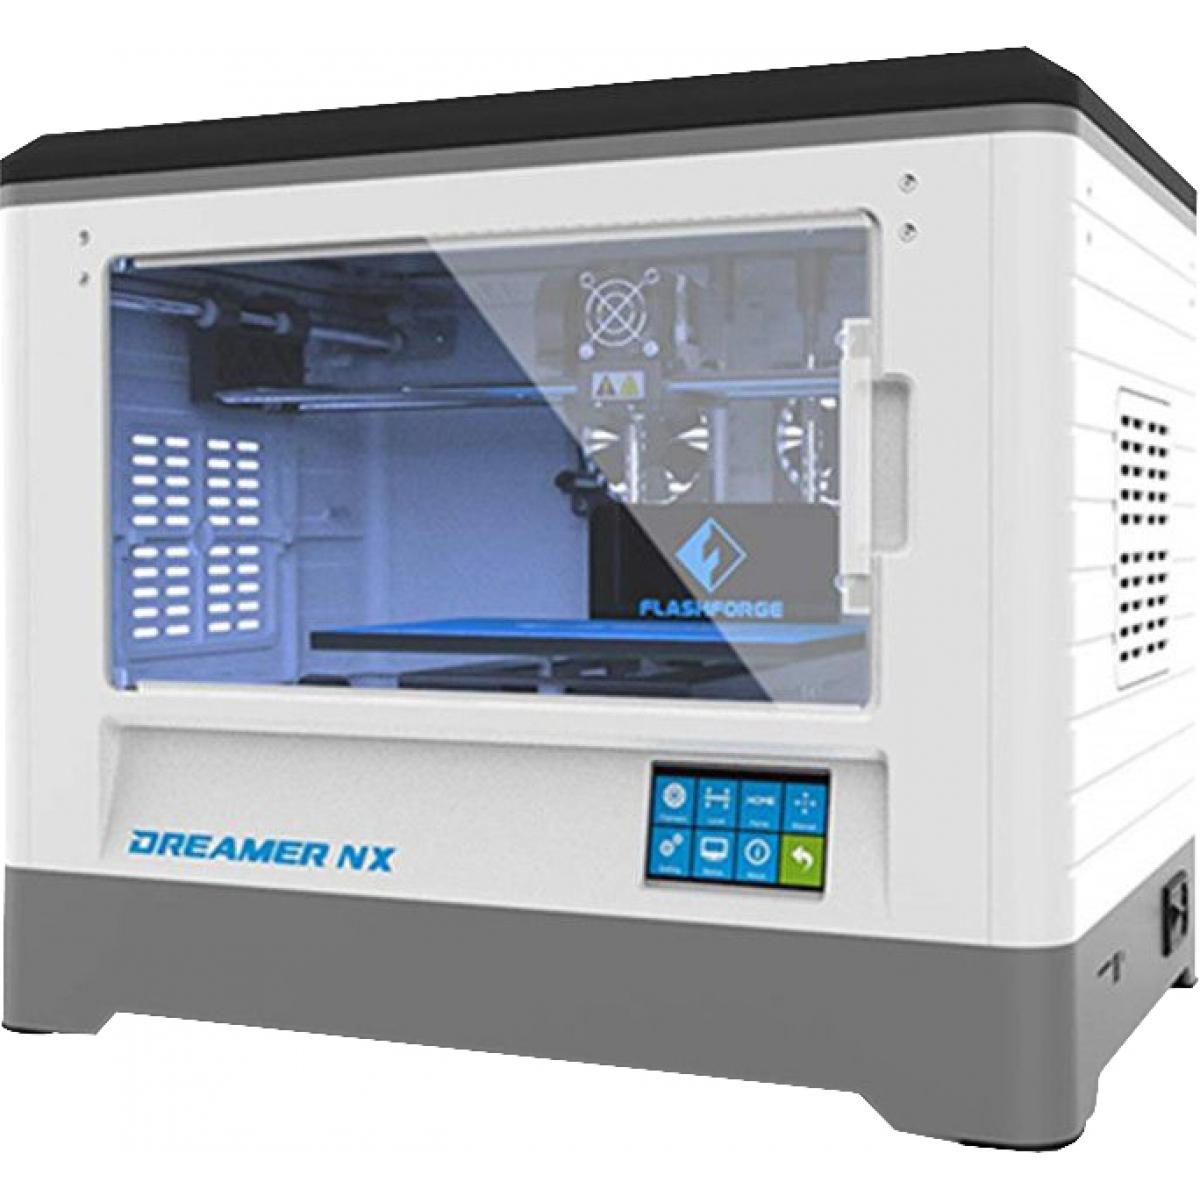 Impressora 3D Flashforge Dreamer NX